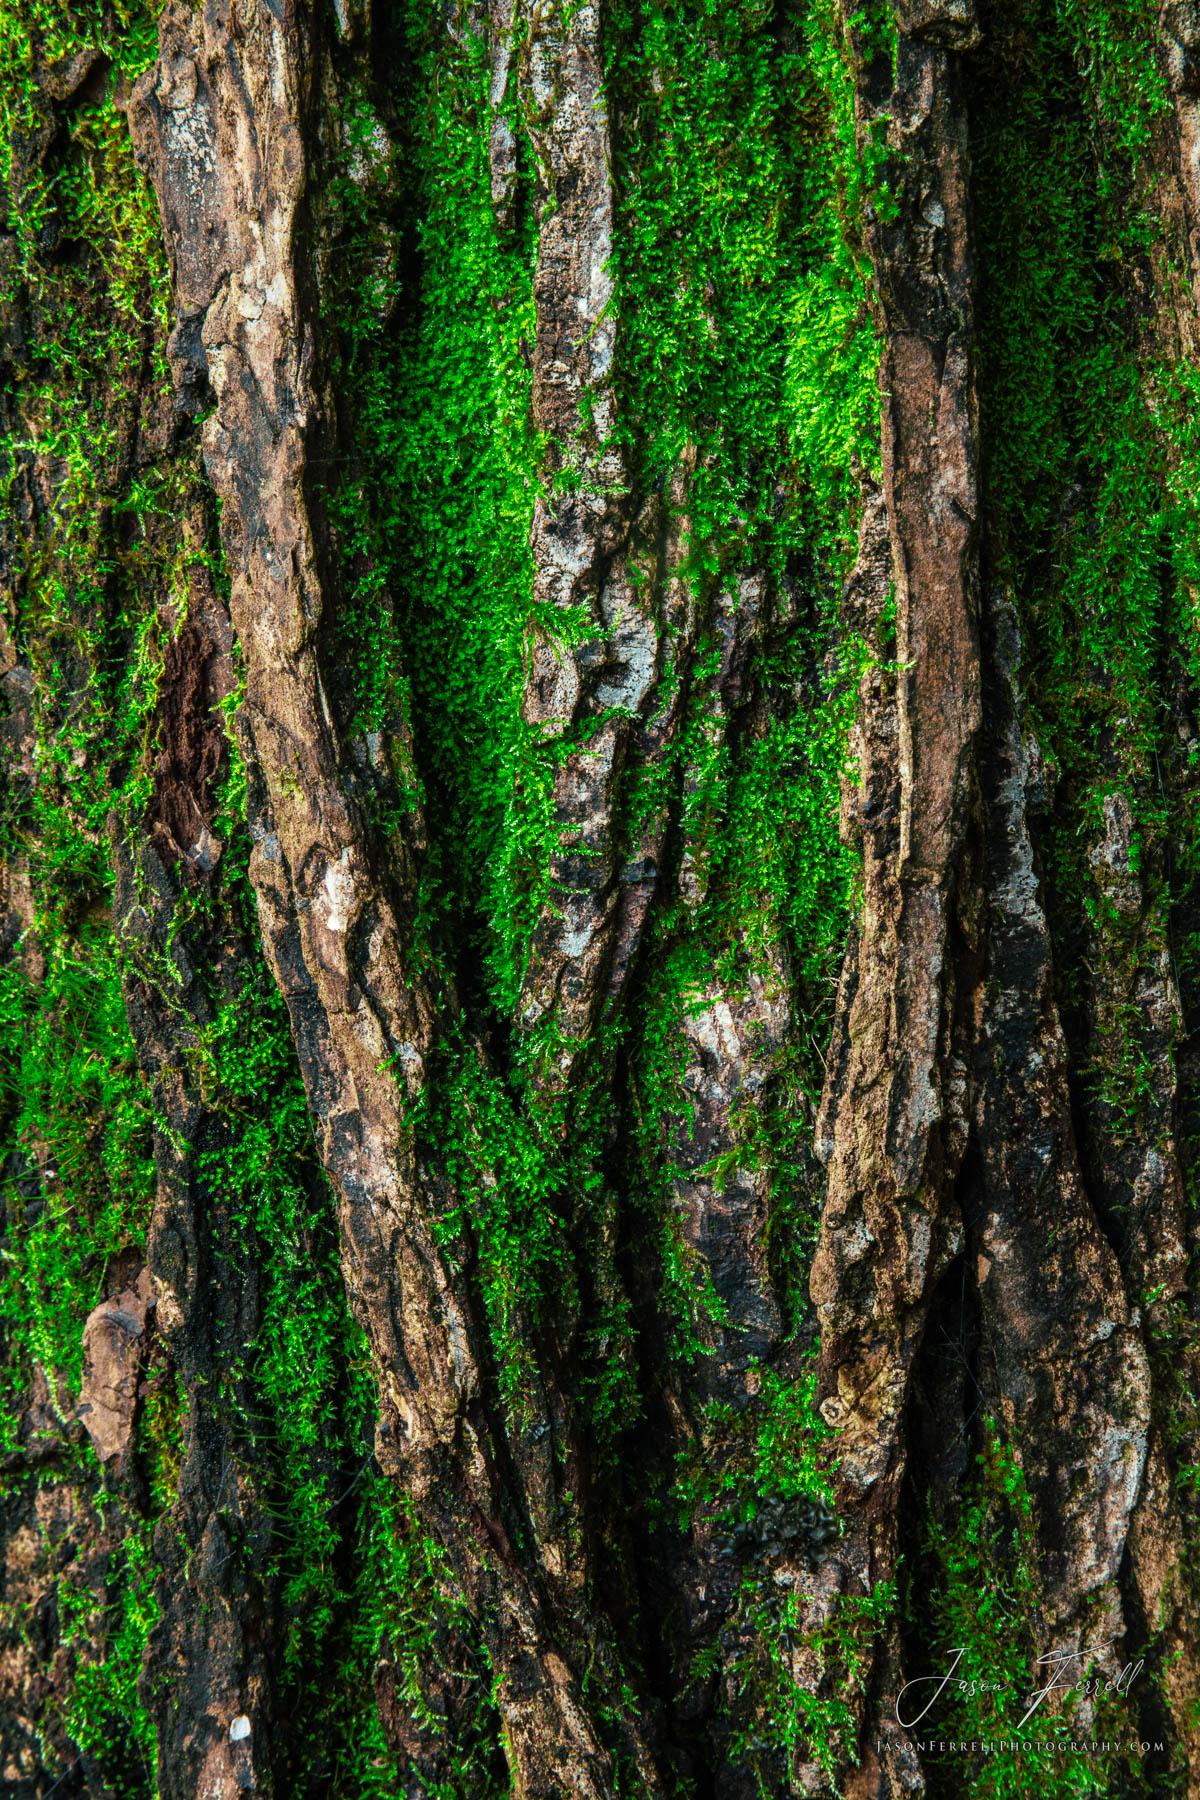 taeda, loblolly, pine tree, bark, texas, moss, forest, cherokee county, texas, photo